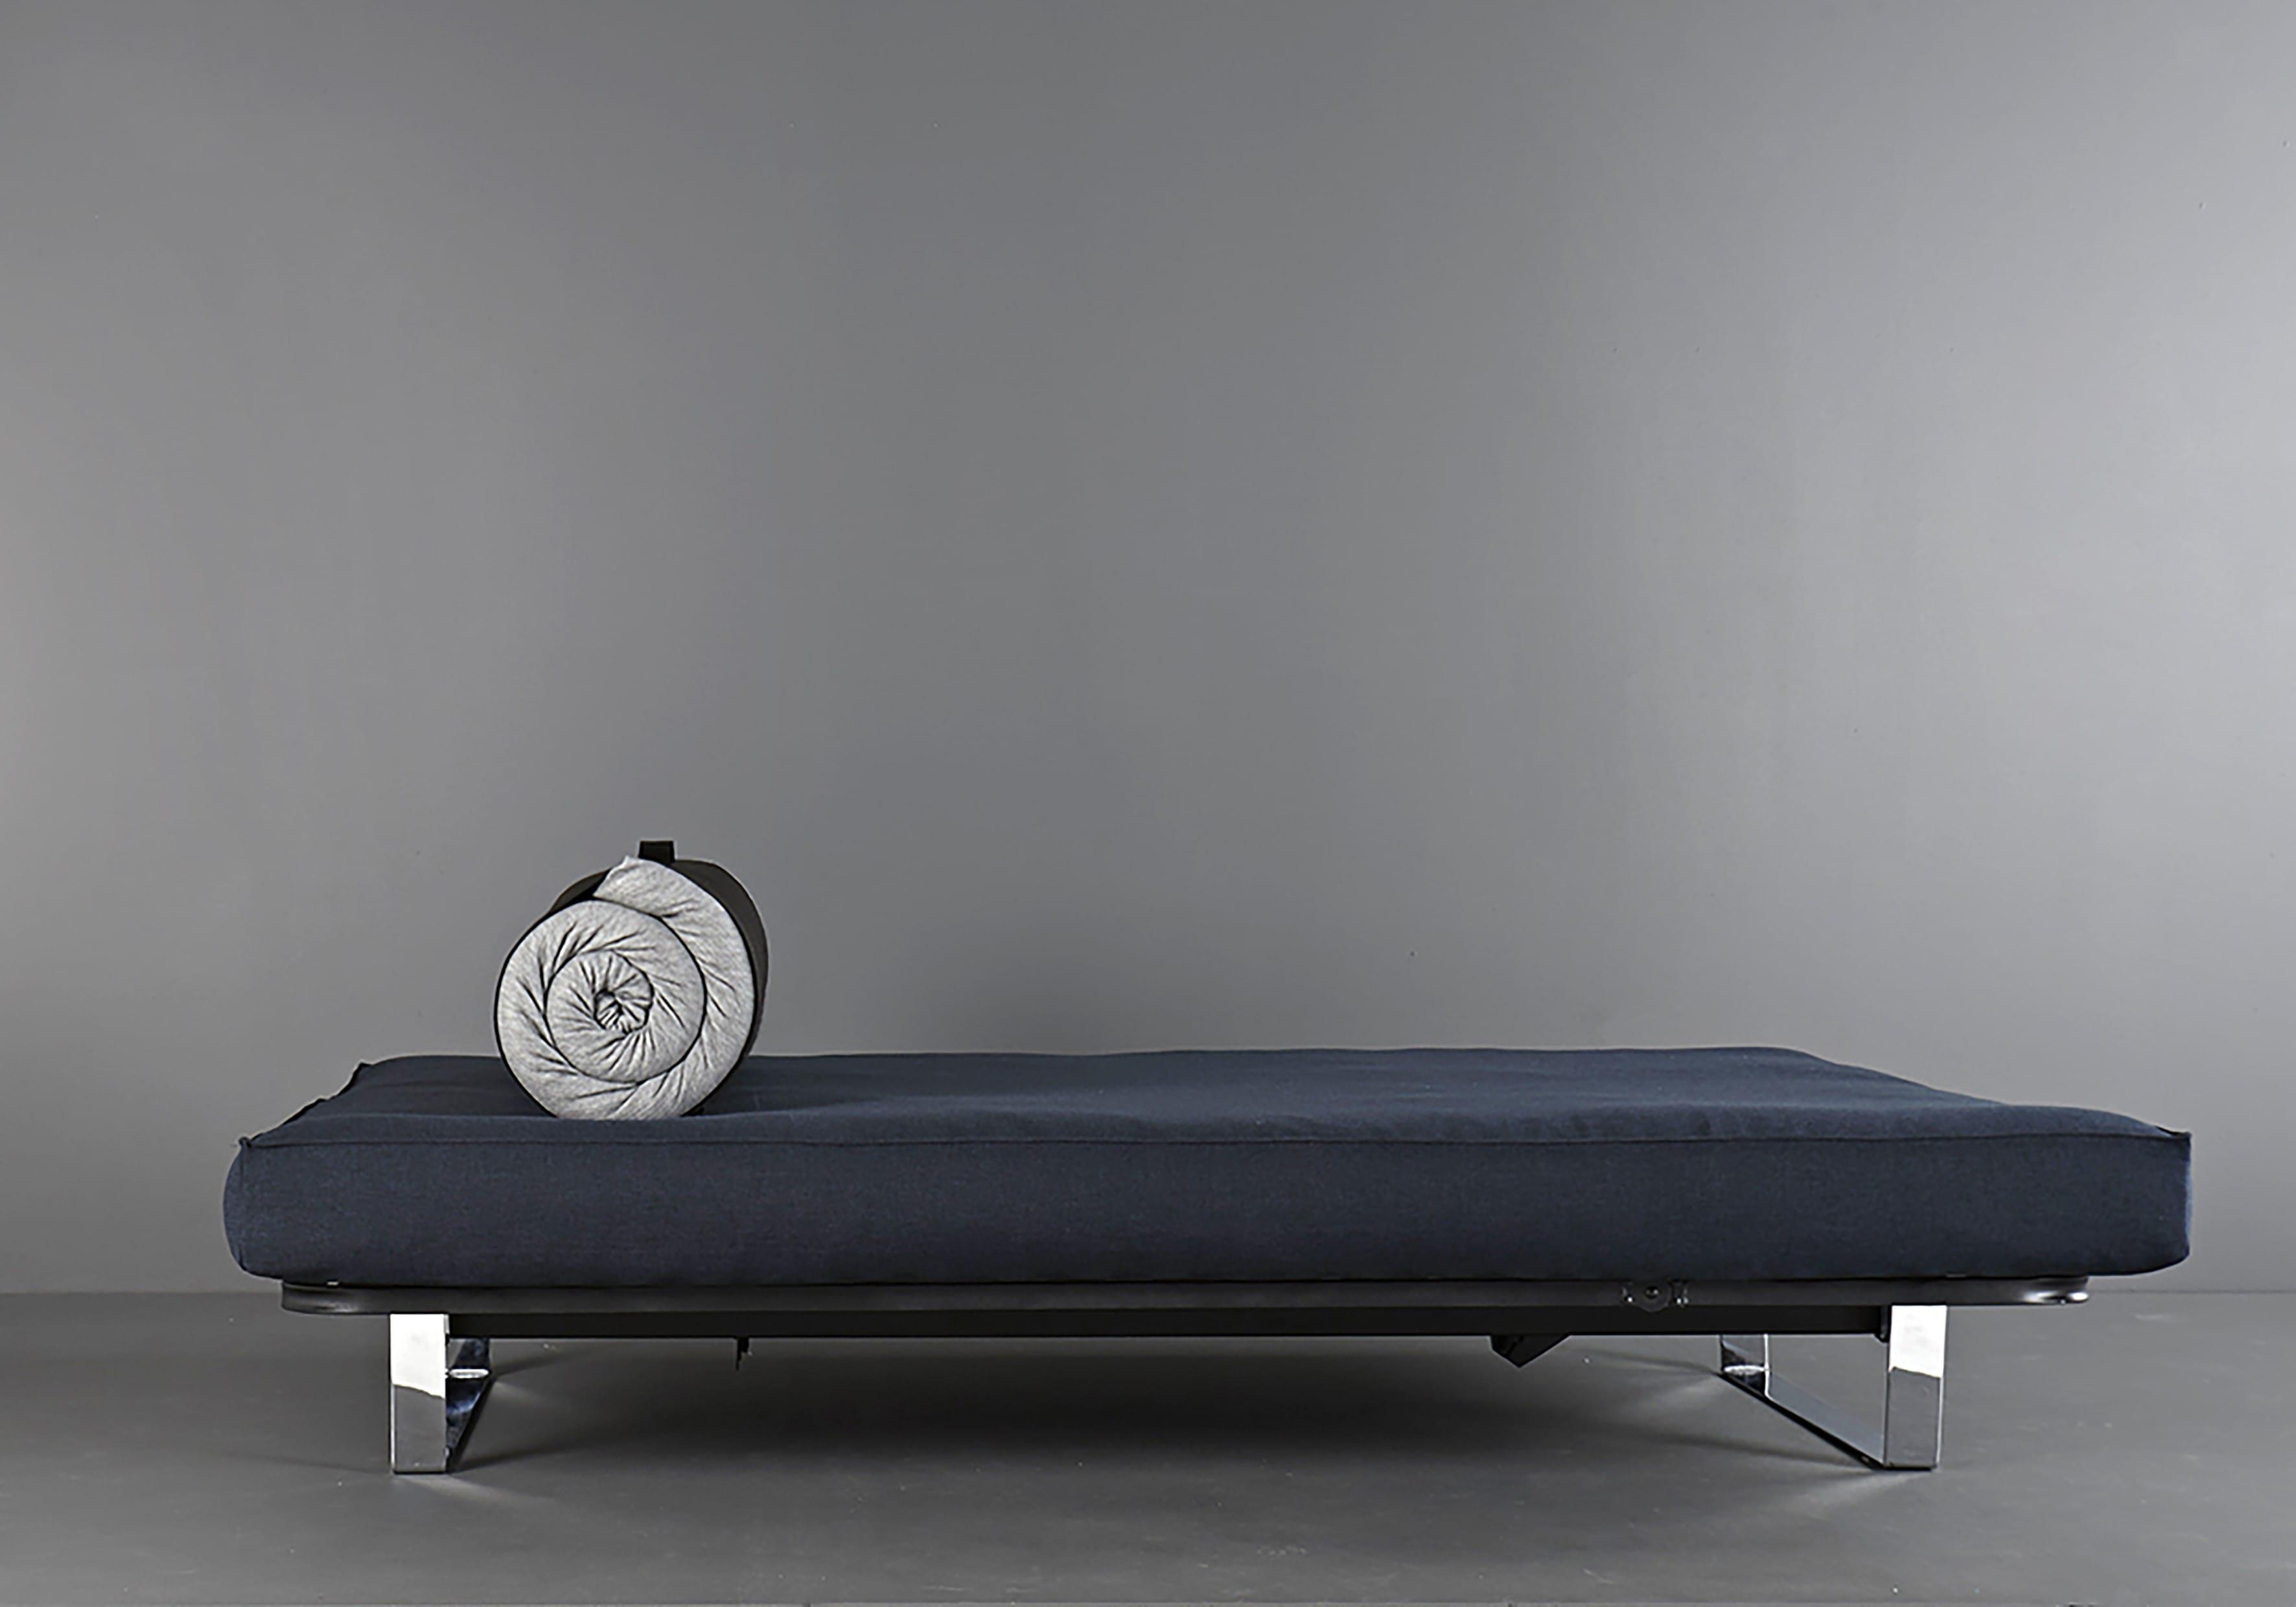 Inno Mattress Topper wStorage Bag by Innovation